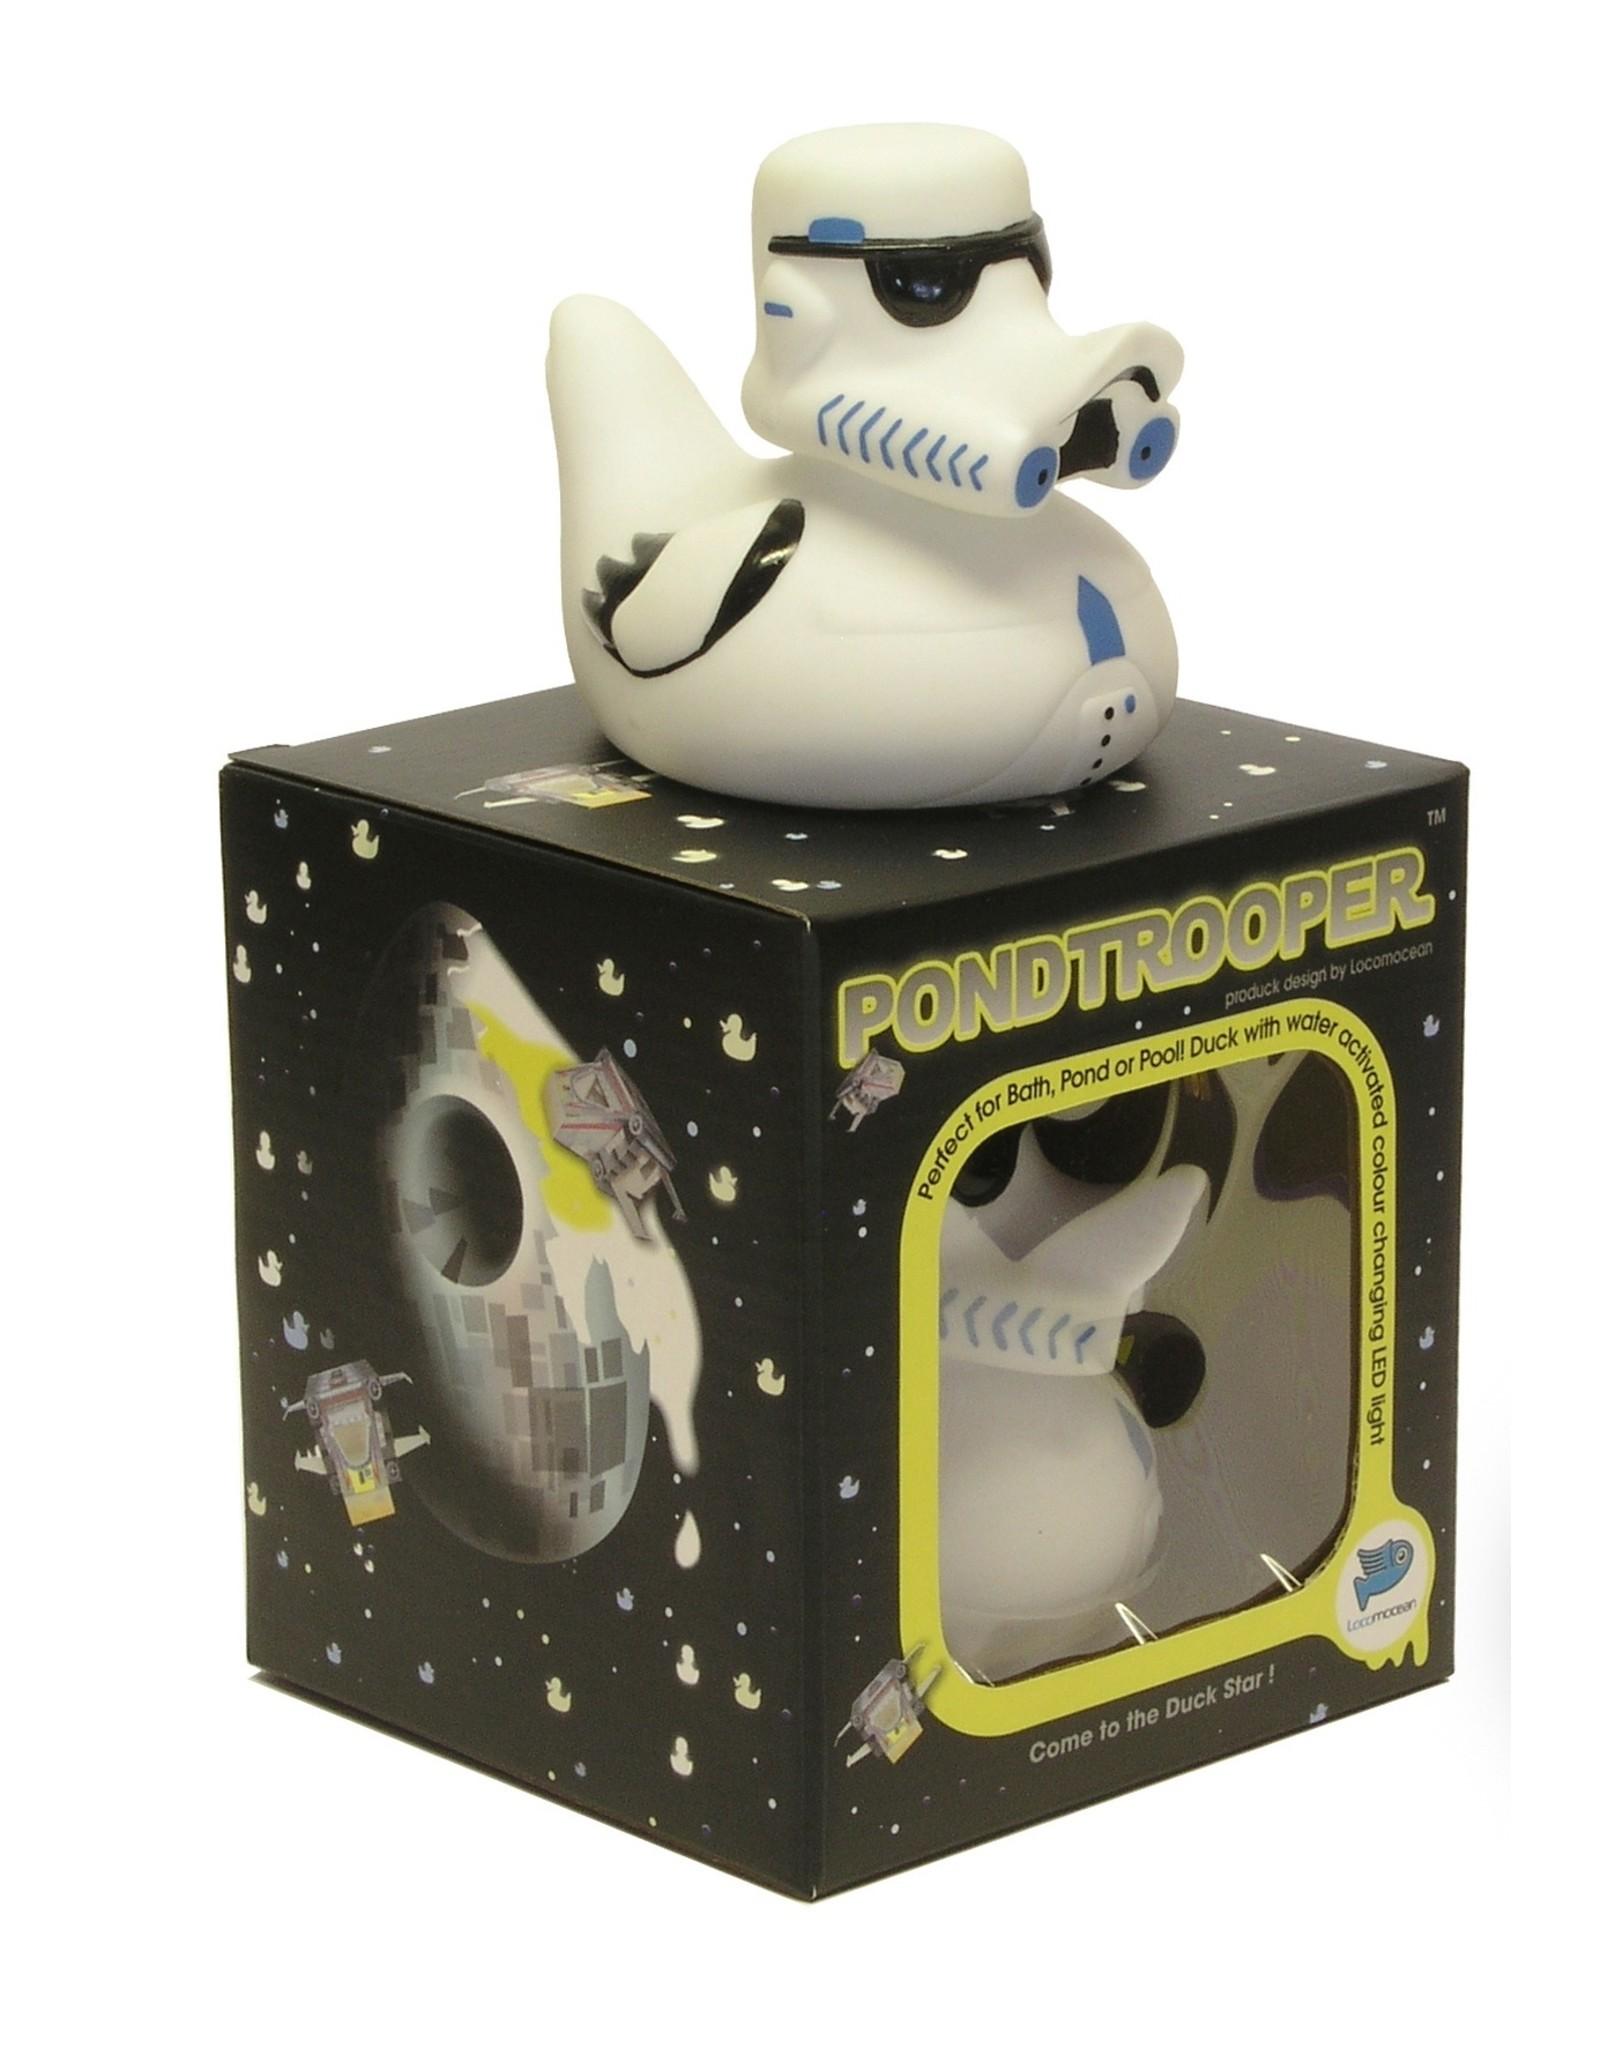 Pond Trooper - Glow in the Dark Rubber Duck